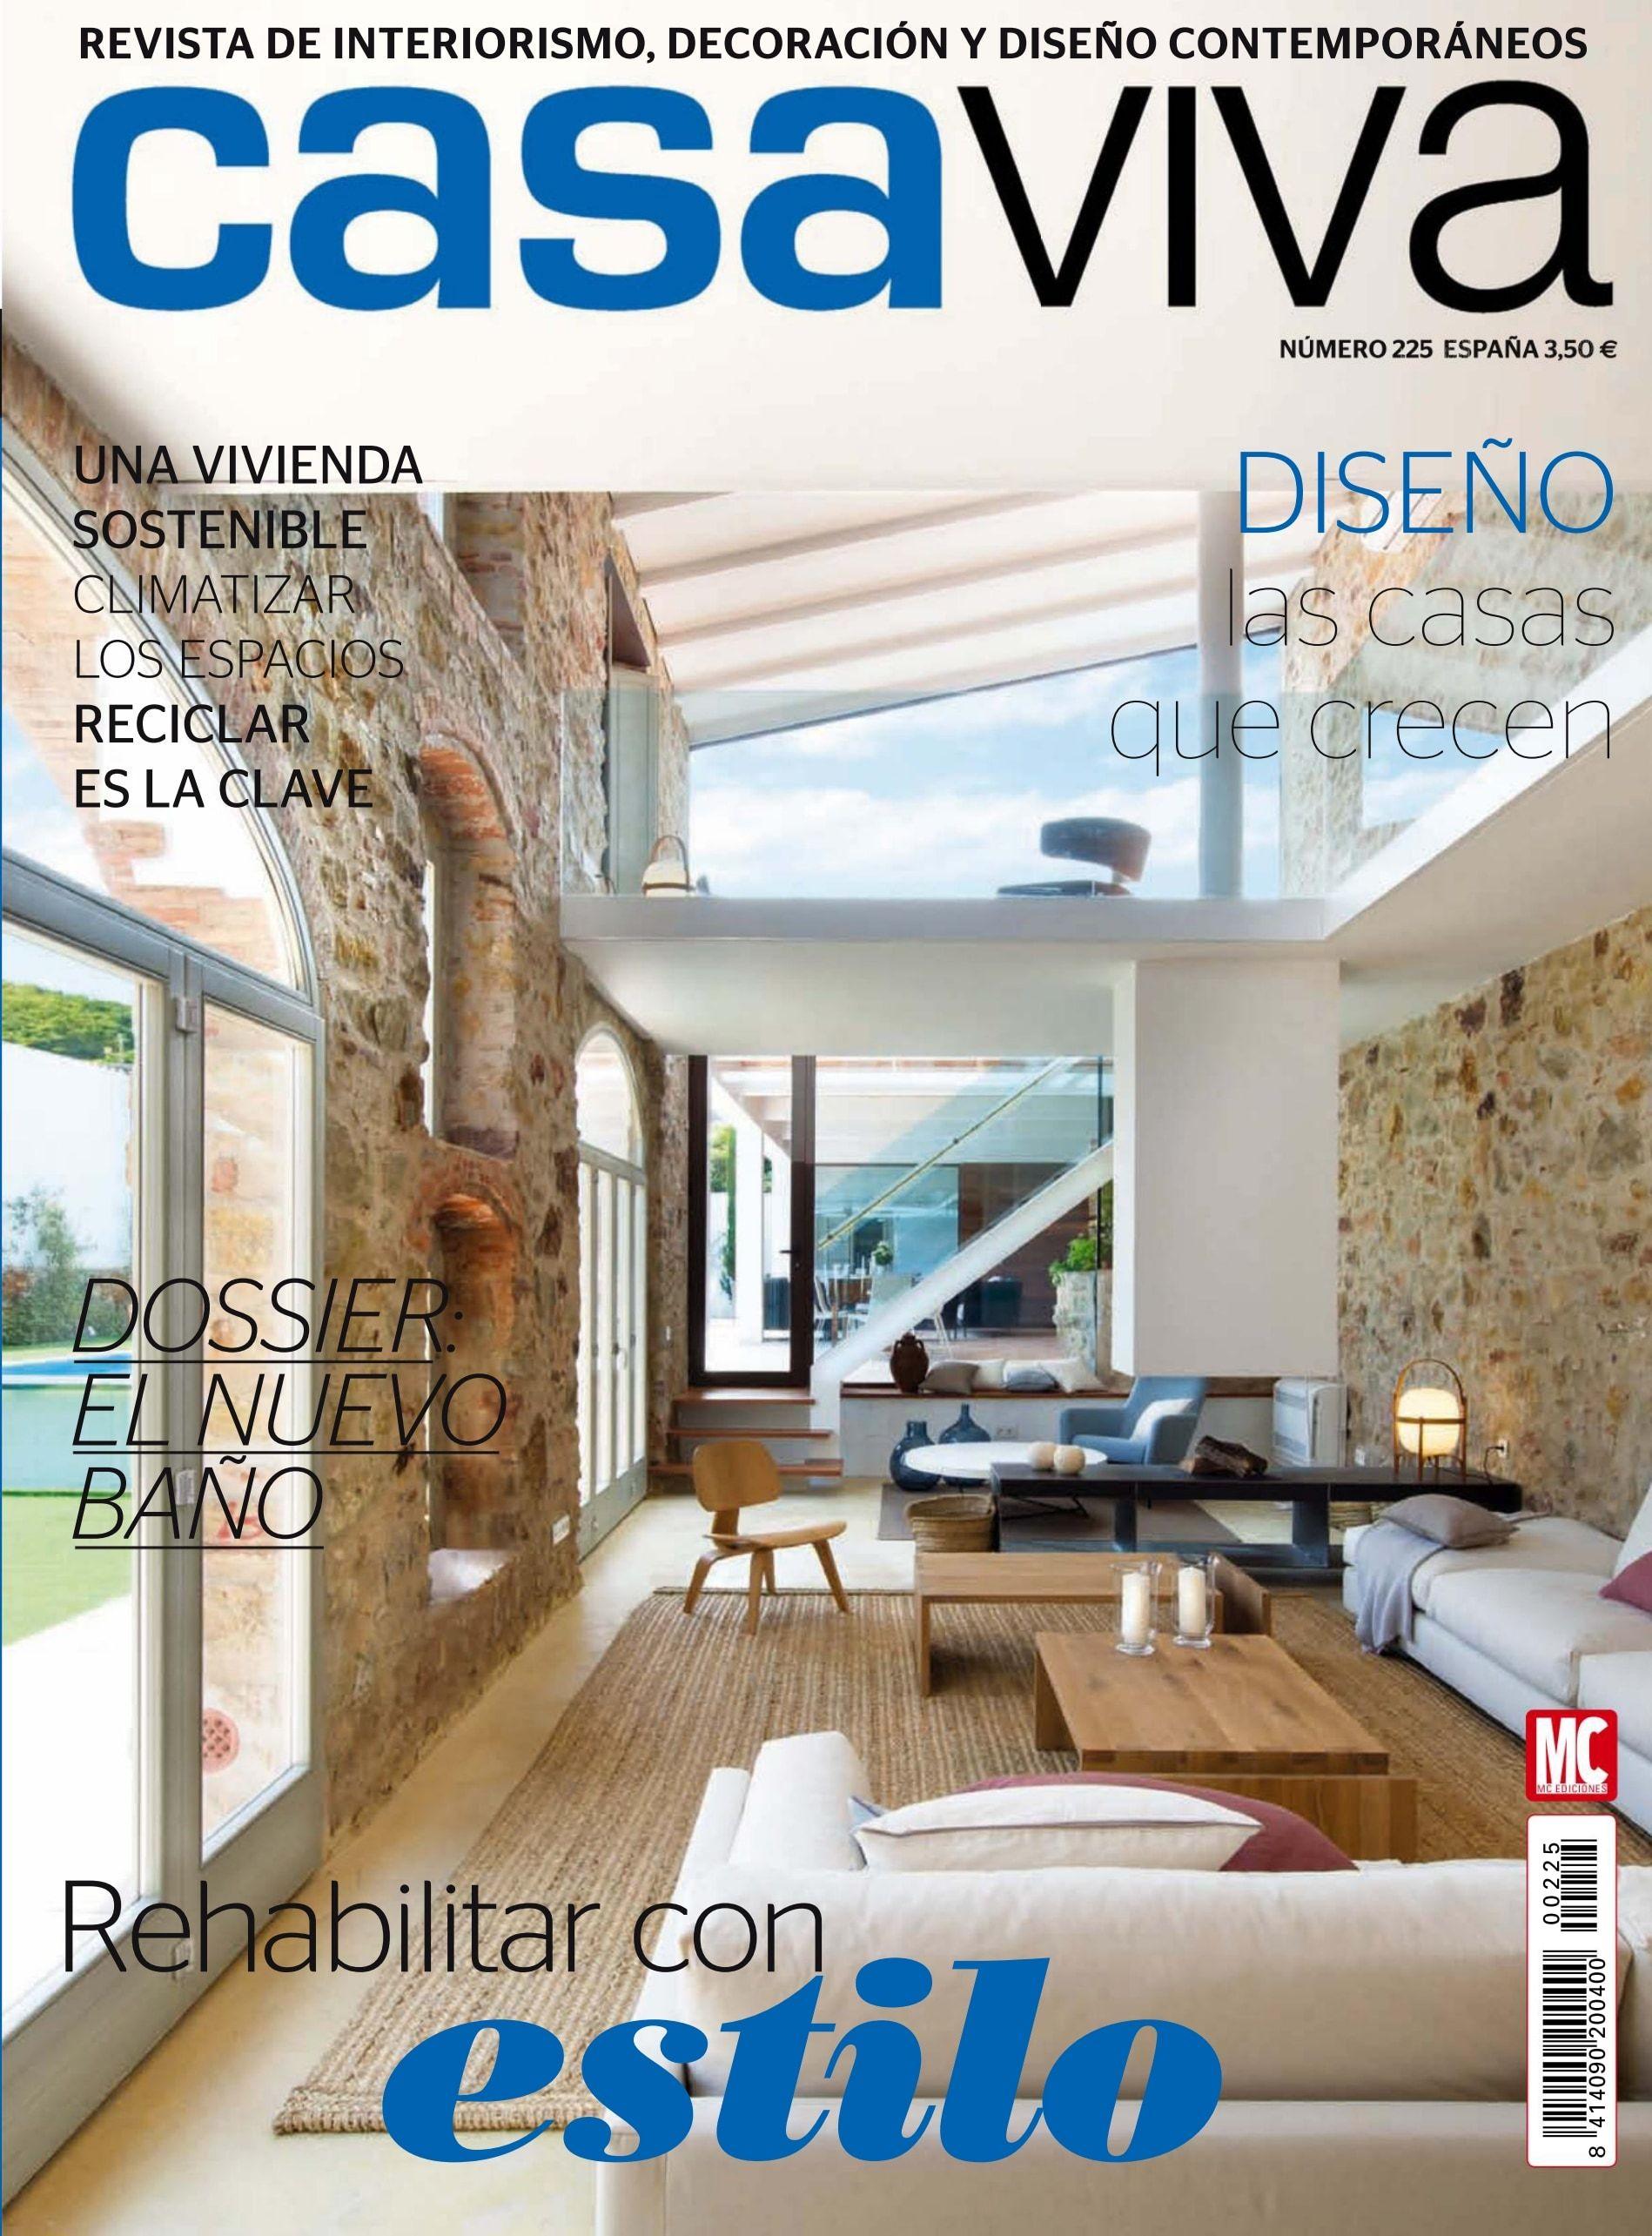 Revista casa viva 225 febrero 2016 rehabilitar con - Libros de decoracion de interiores gratis ...